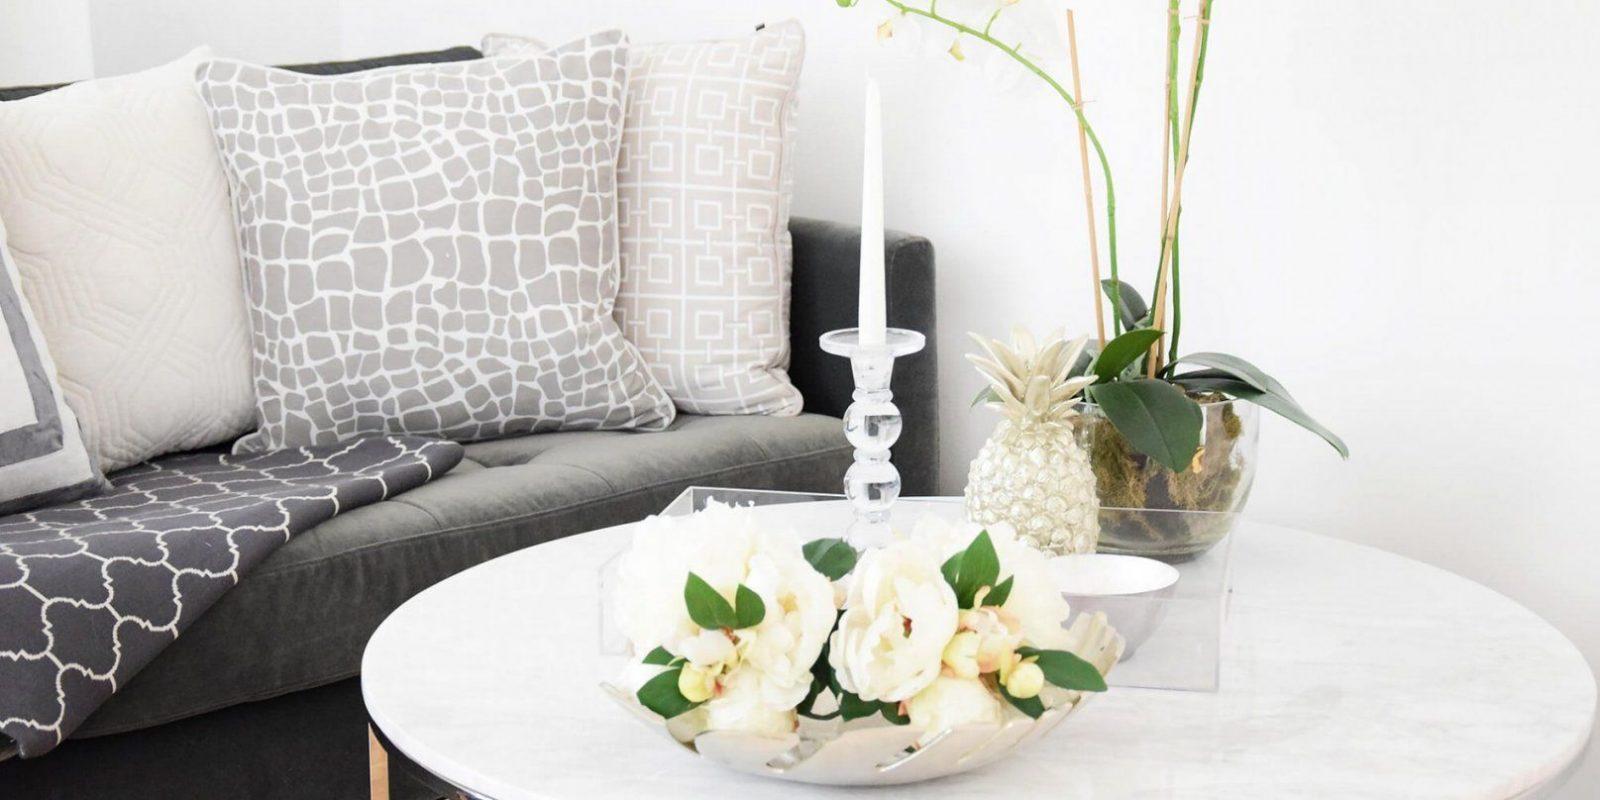 Cool 20 Luxury Couchtisch Marmor Couchtisch Granit Für Couchtisch von Couchtisch Marmor Couchtisch Granit Bild